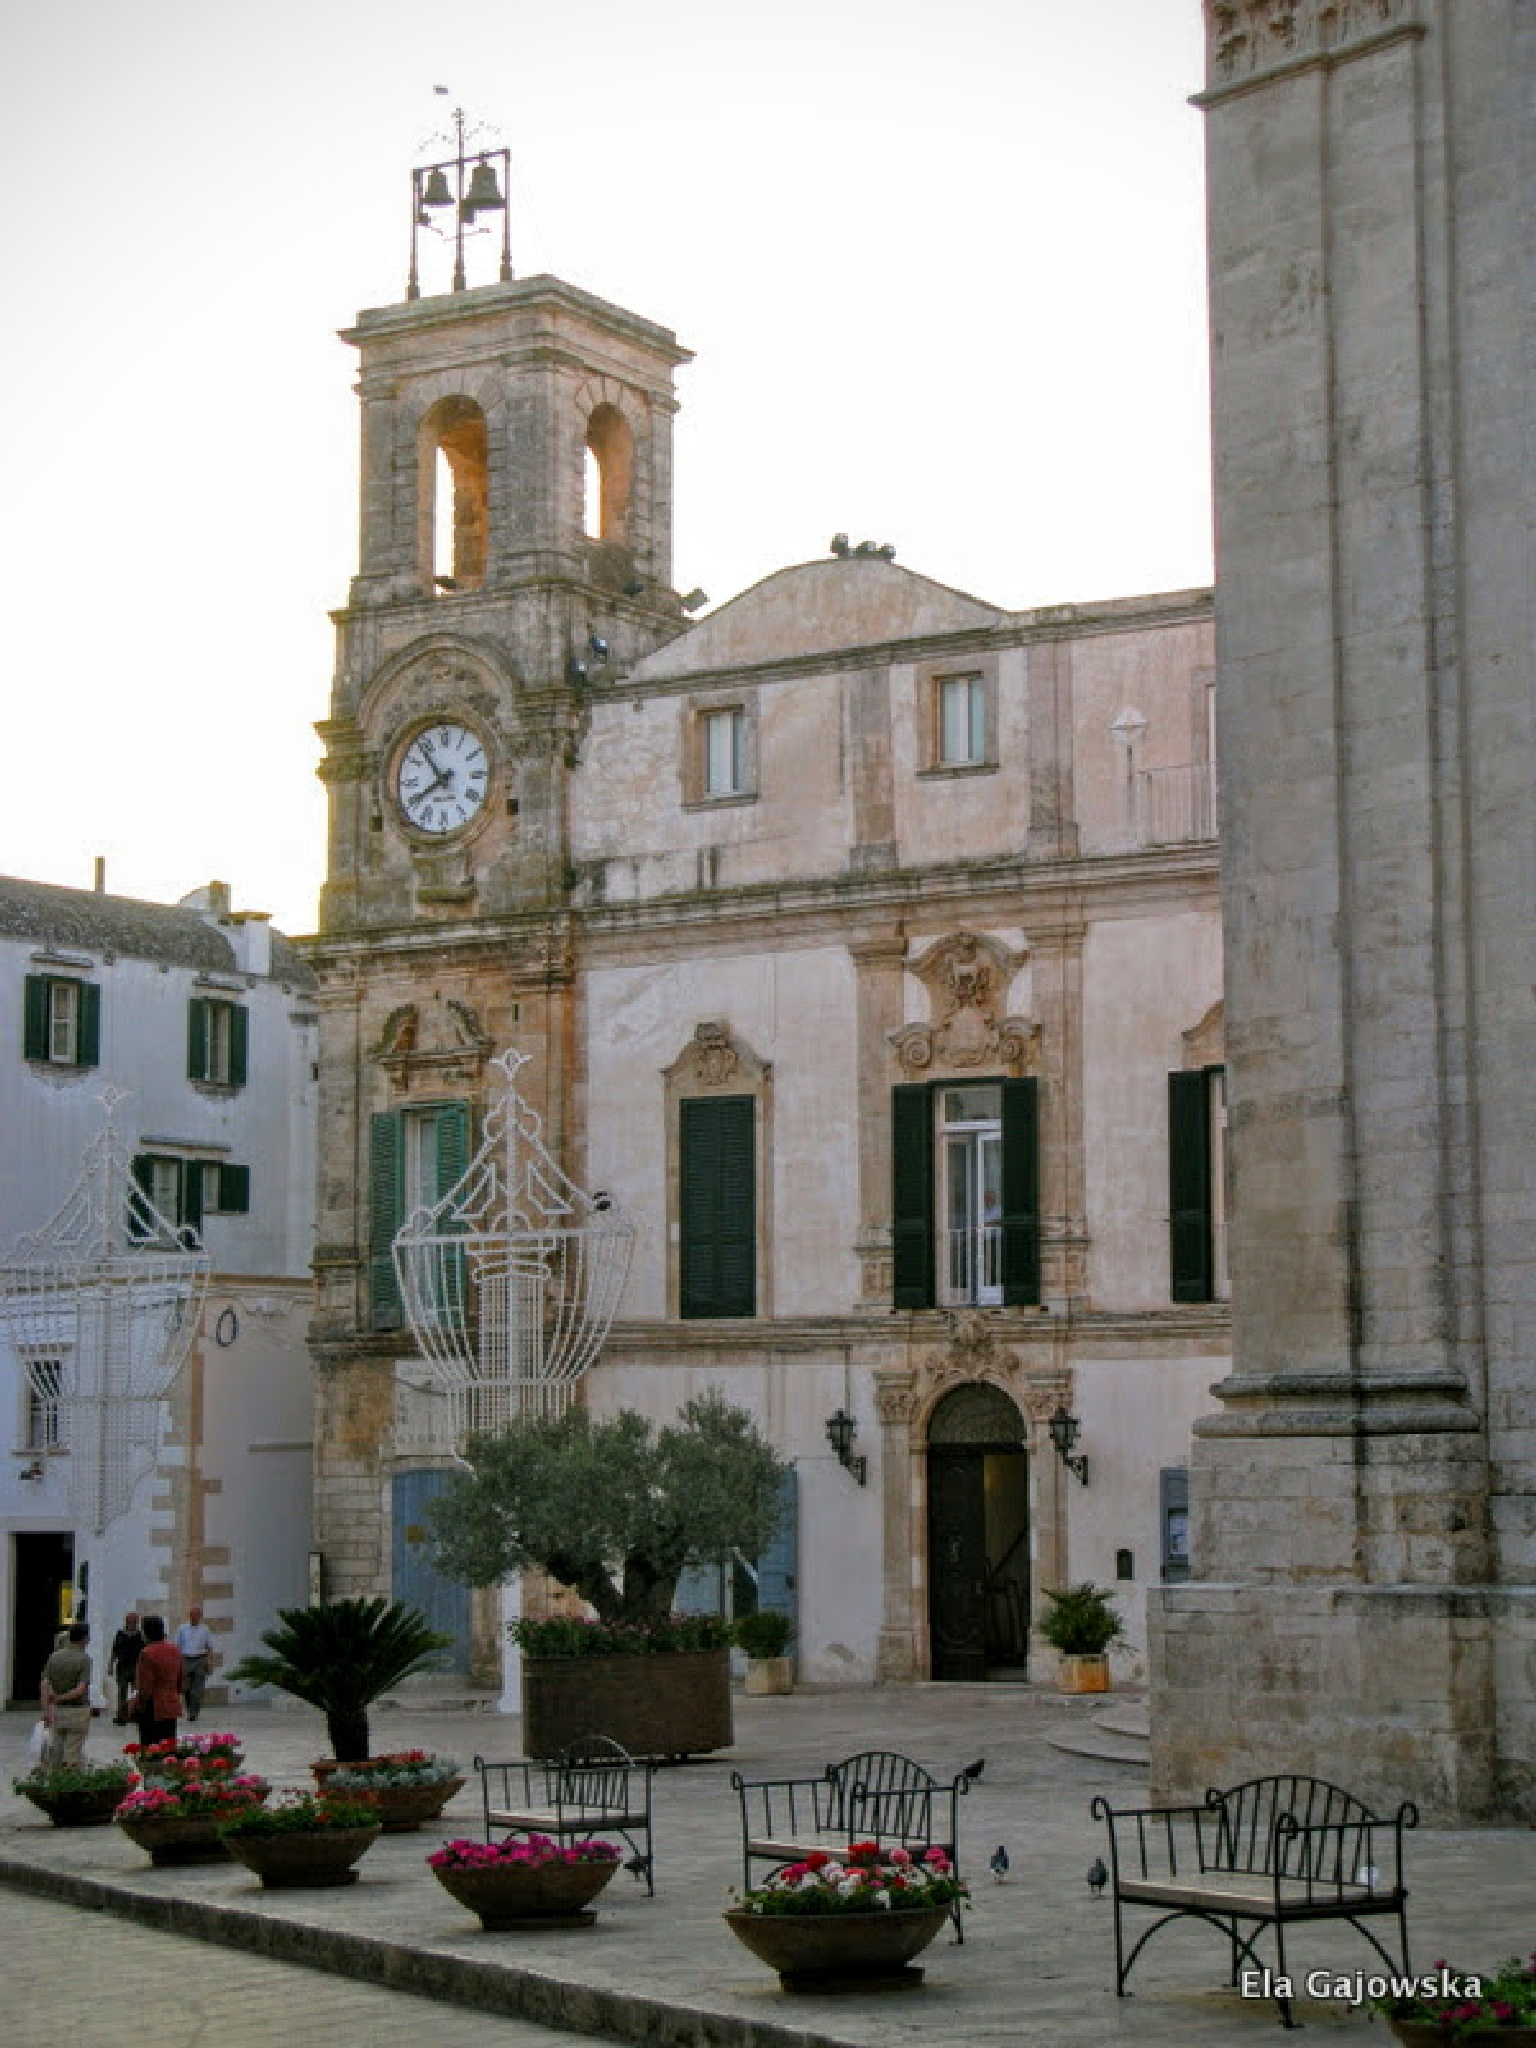 A lovely evening in Martina Franca, Puglia by Ela Gajowska